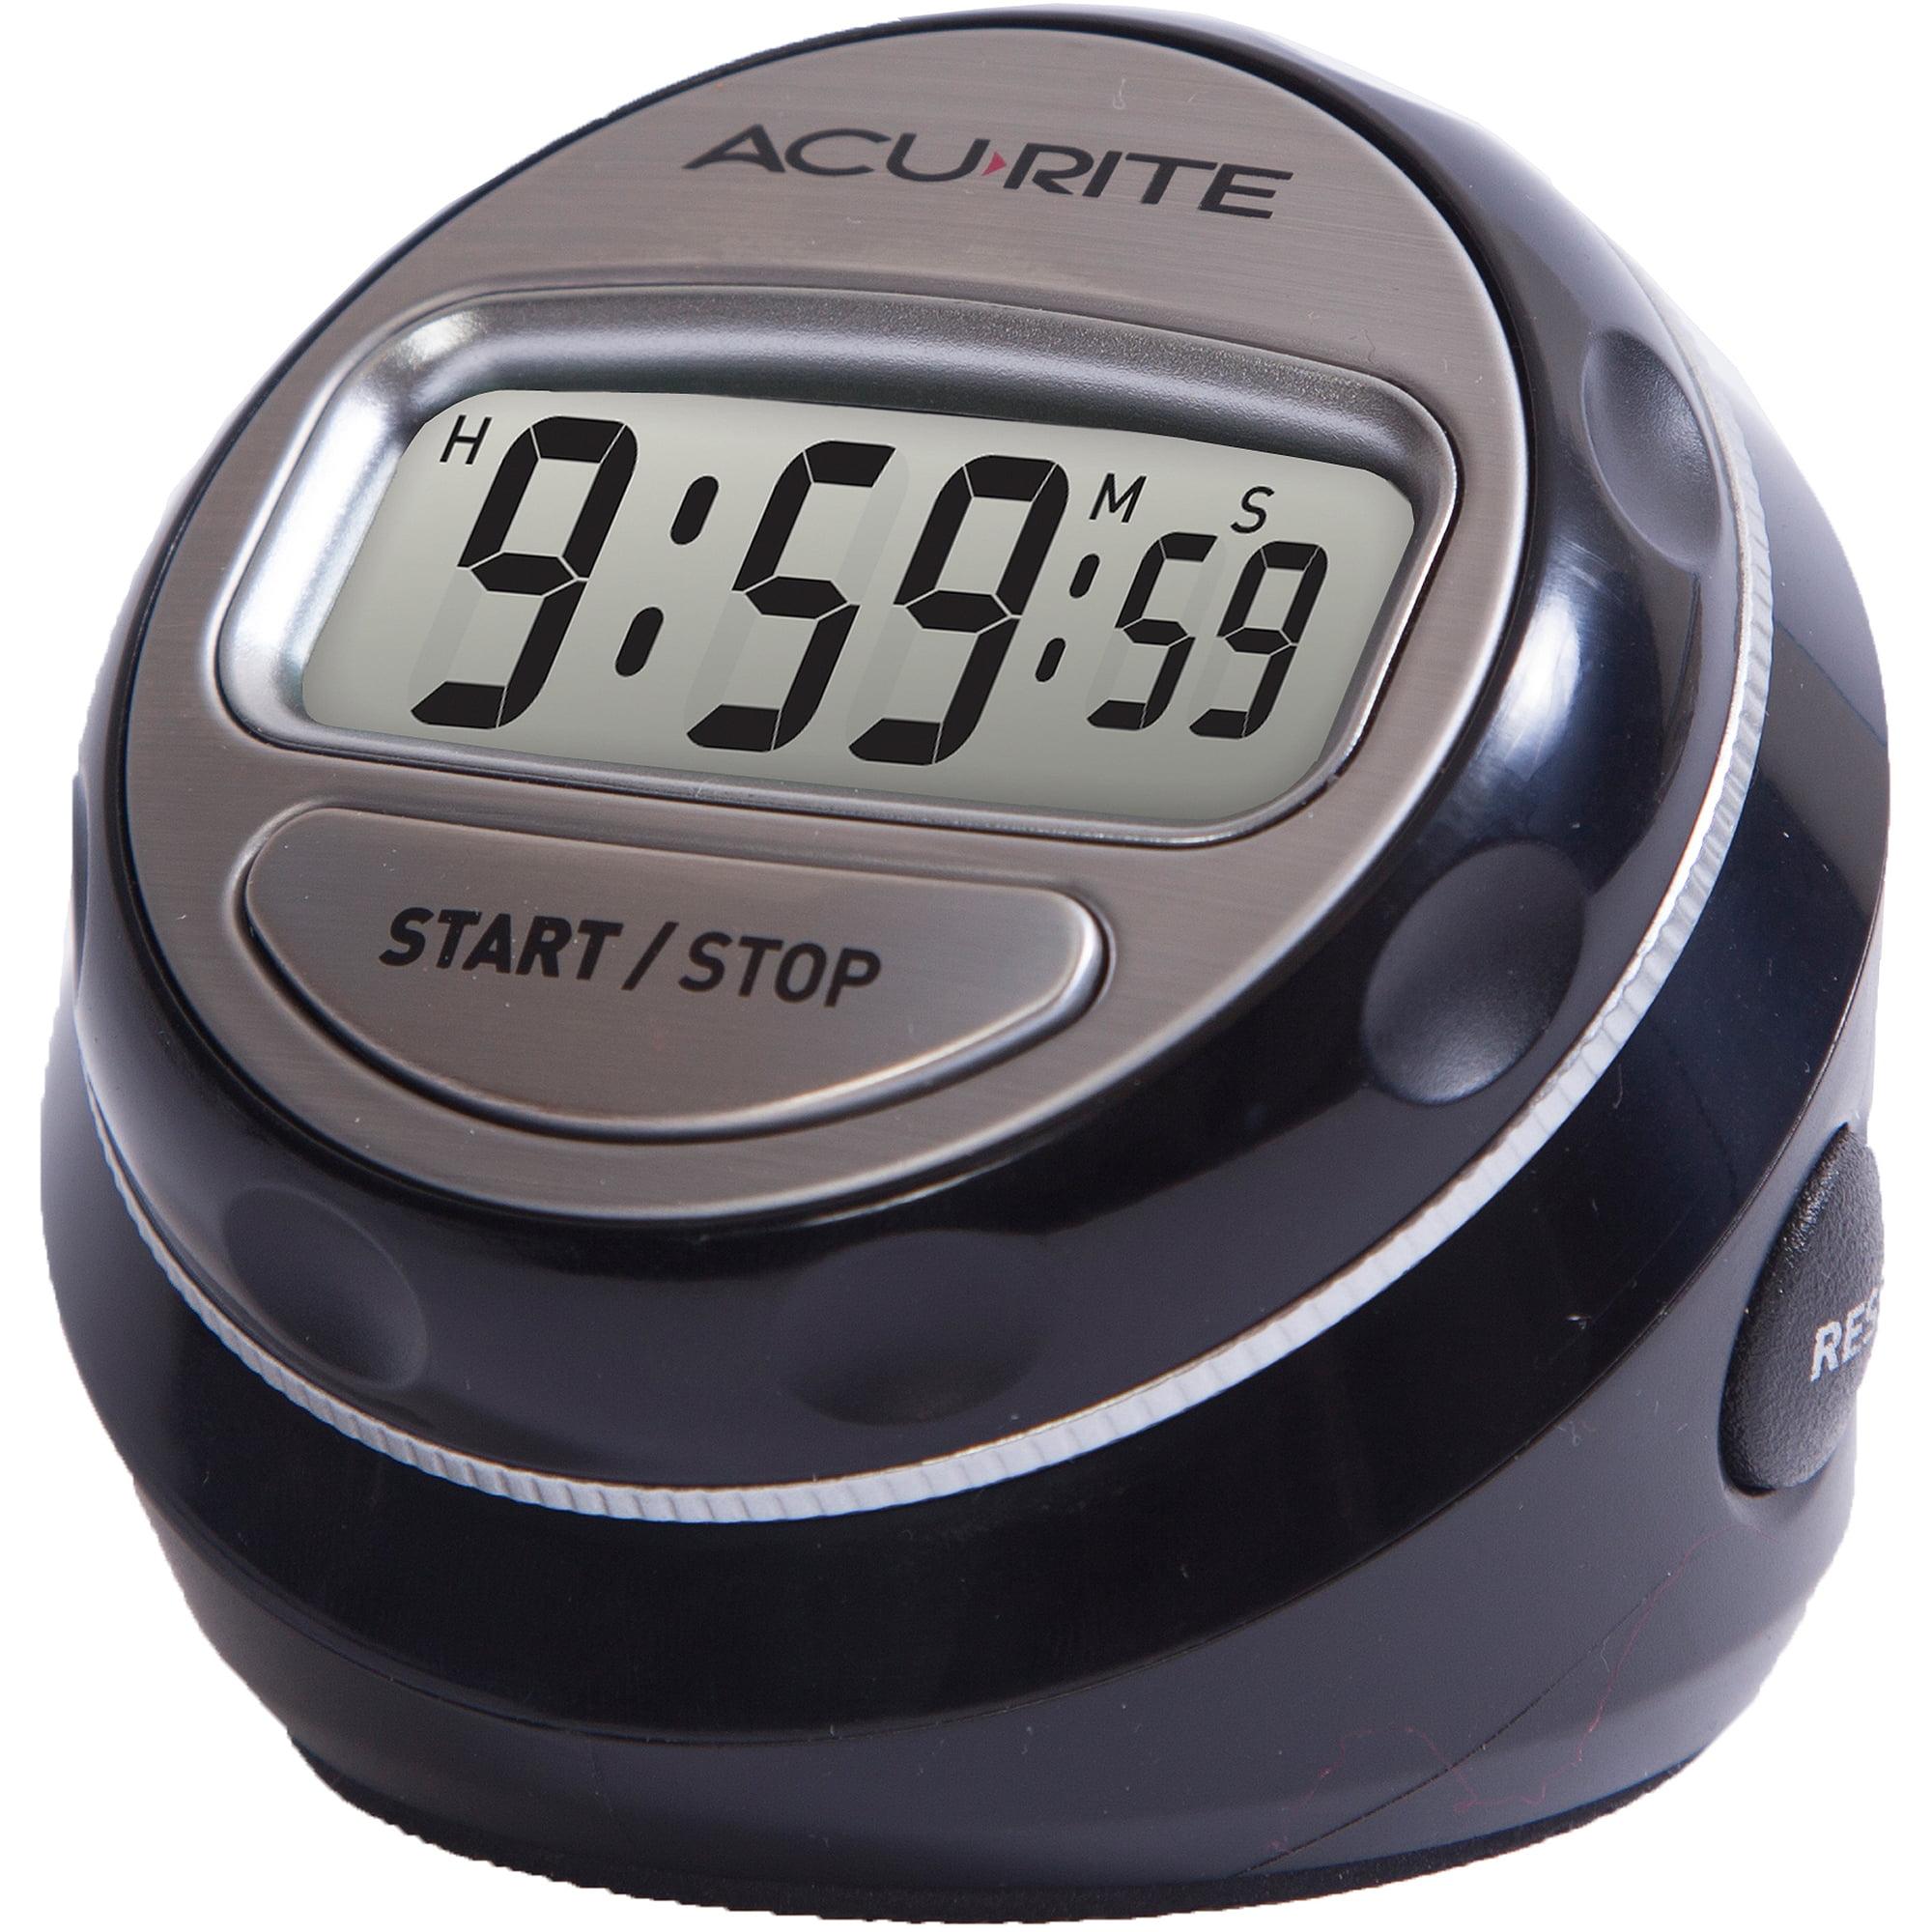 AcuRite Digital Twist Timer